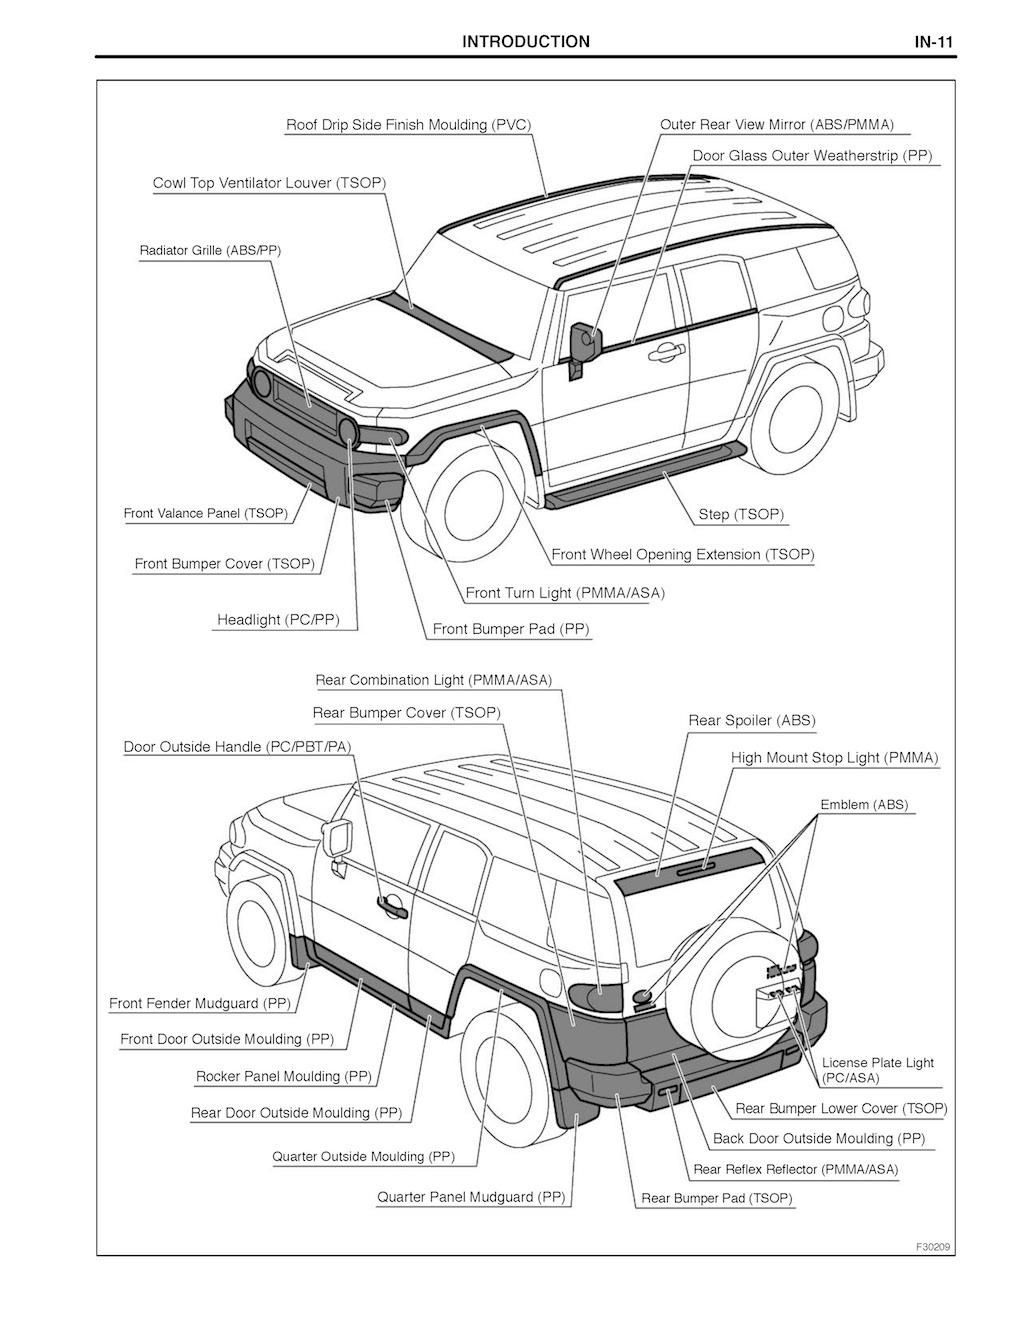 FREE: 2007 FJ Cruiser, OEM Electrical Wiring and Body - OEM